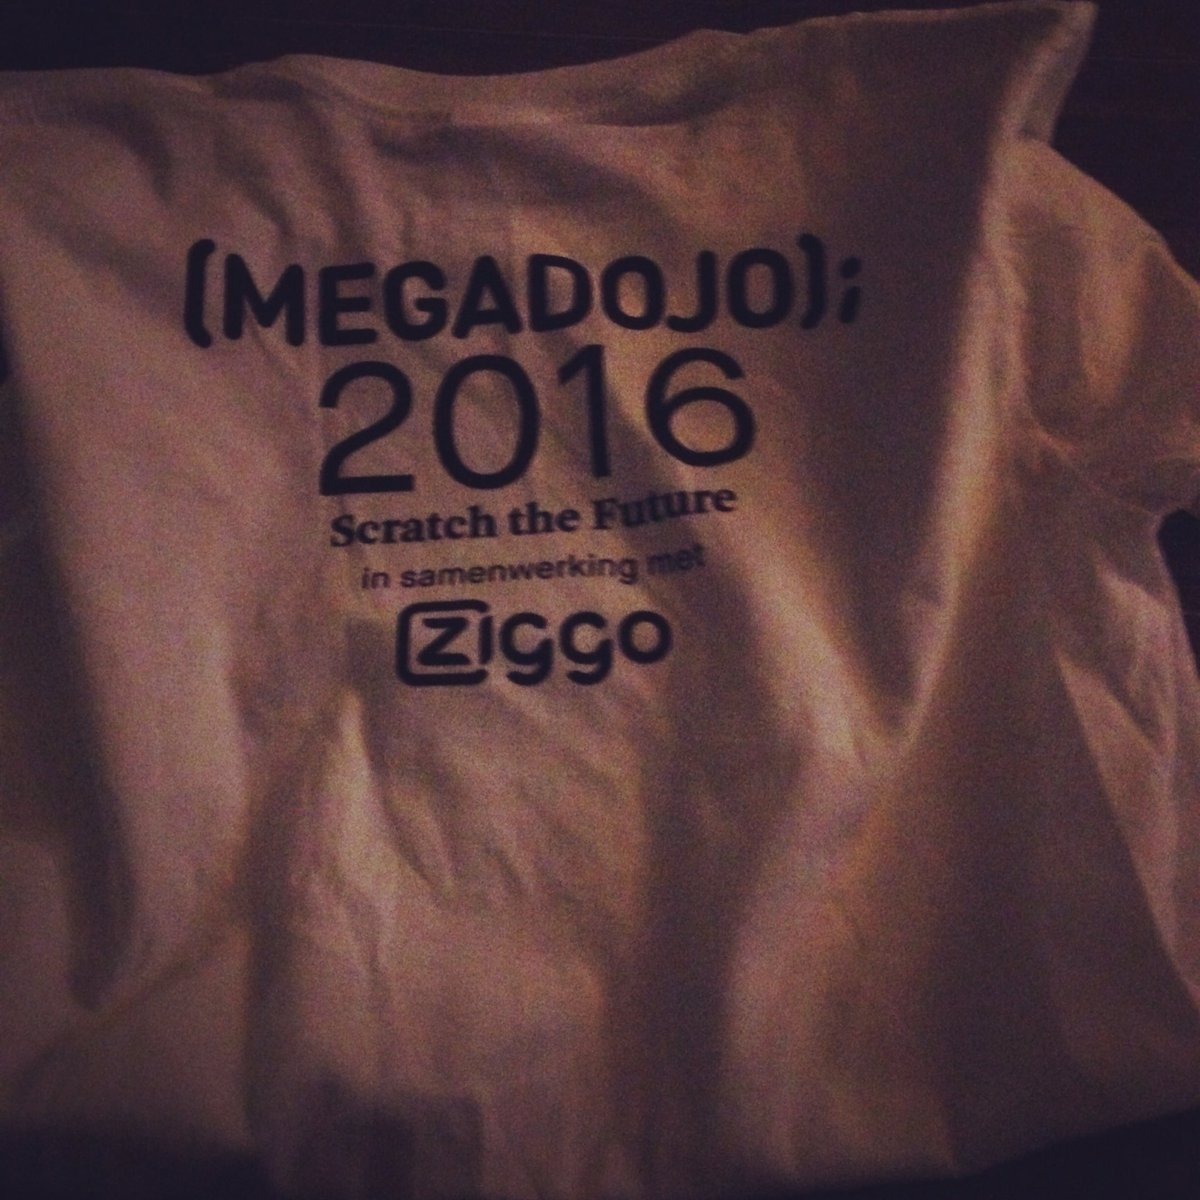 #megadojonl #Scratchthefuture  #ziggodome super georganiseerd! https://t.co/HXt2gfQxj4